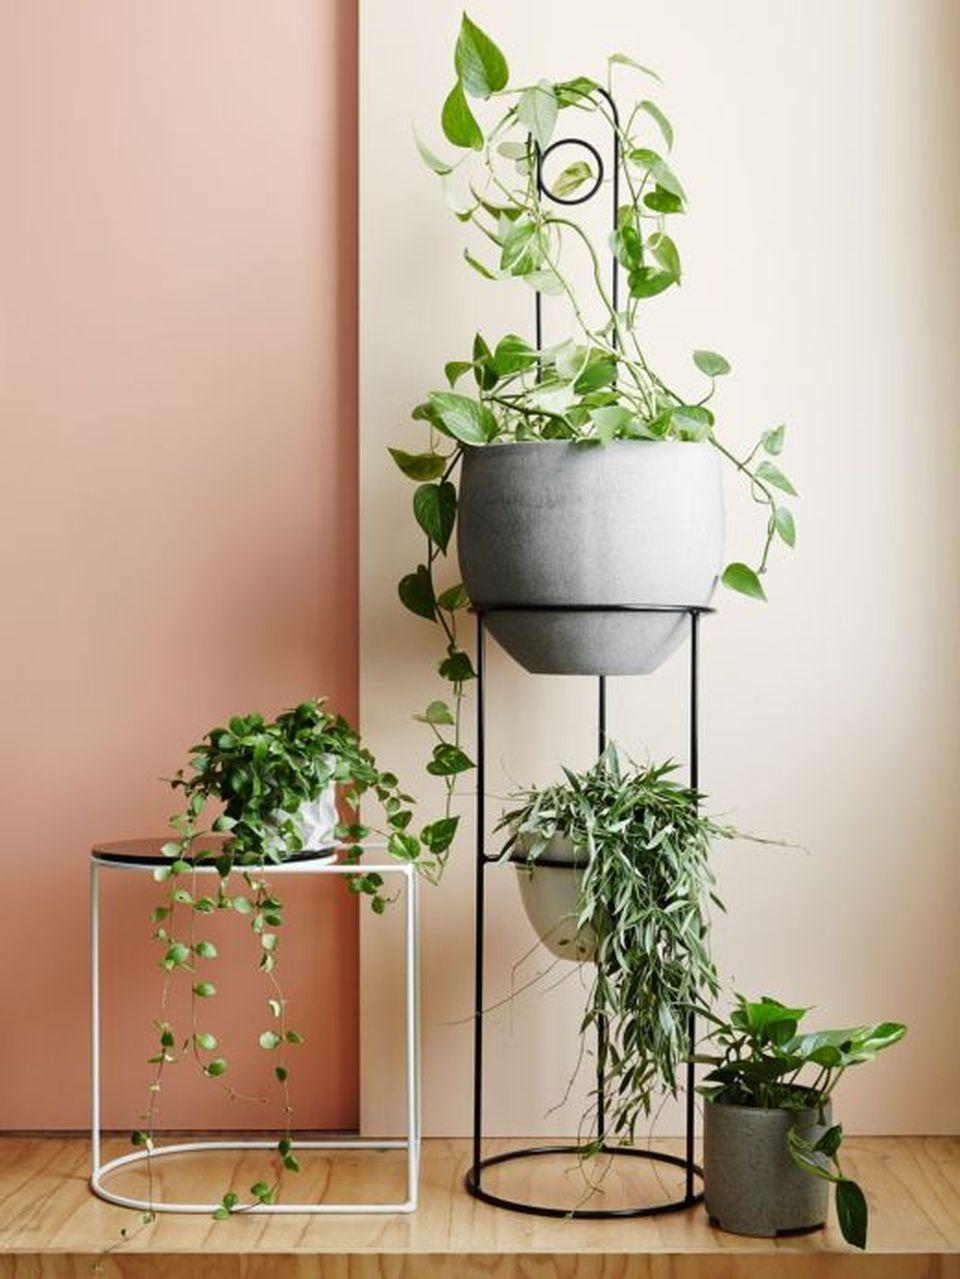 Cool plant stand design ideas for indoor houseplant interiordesignplants